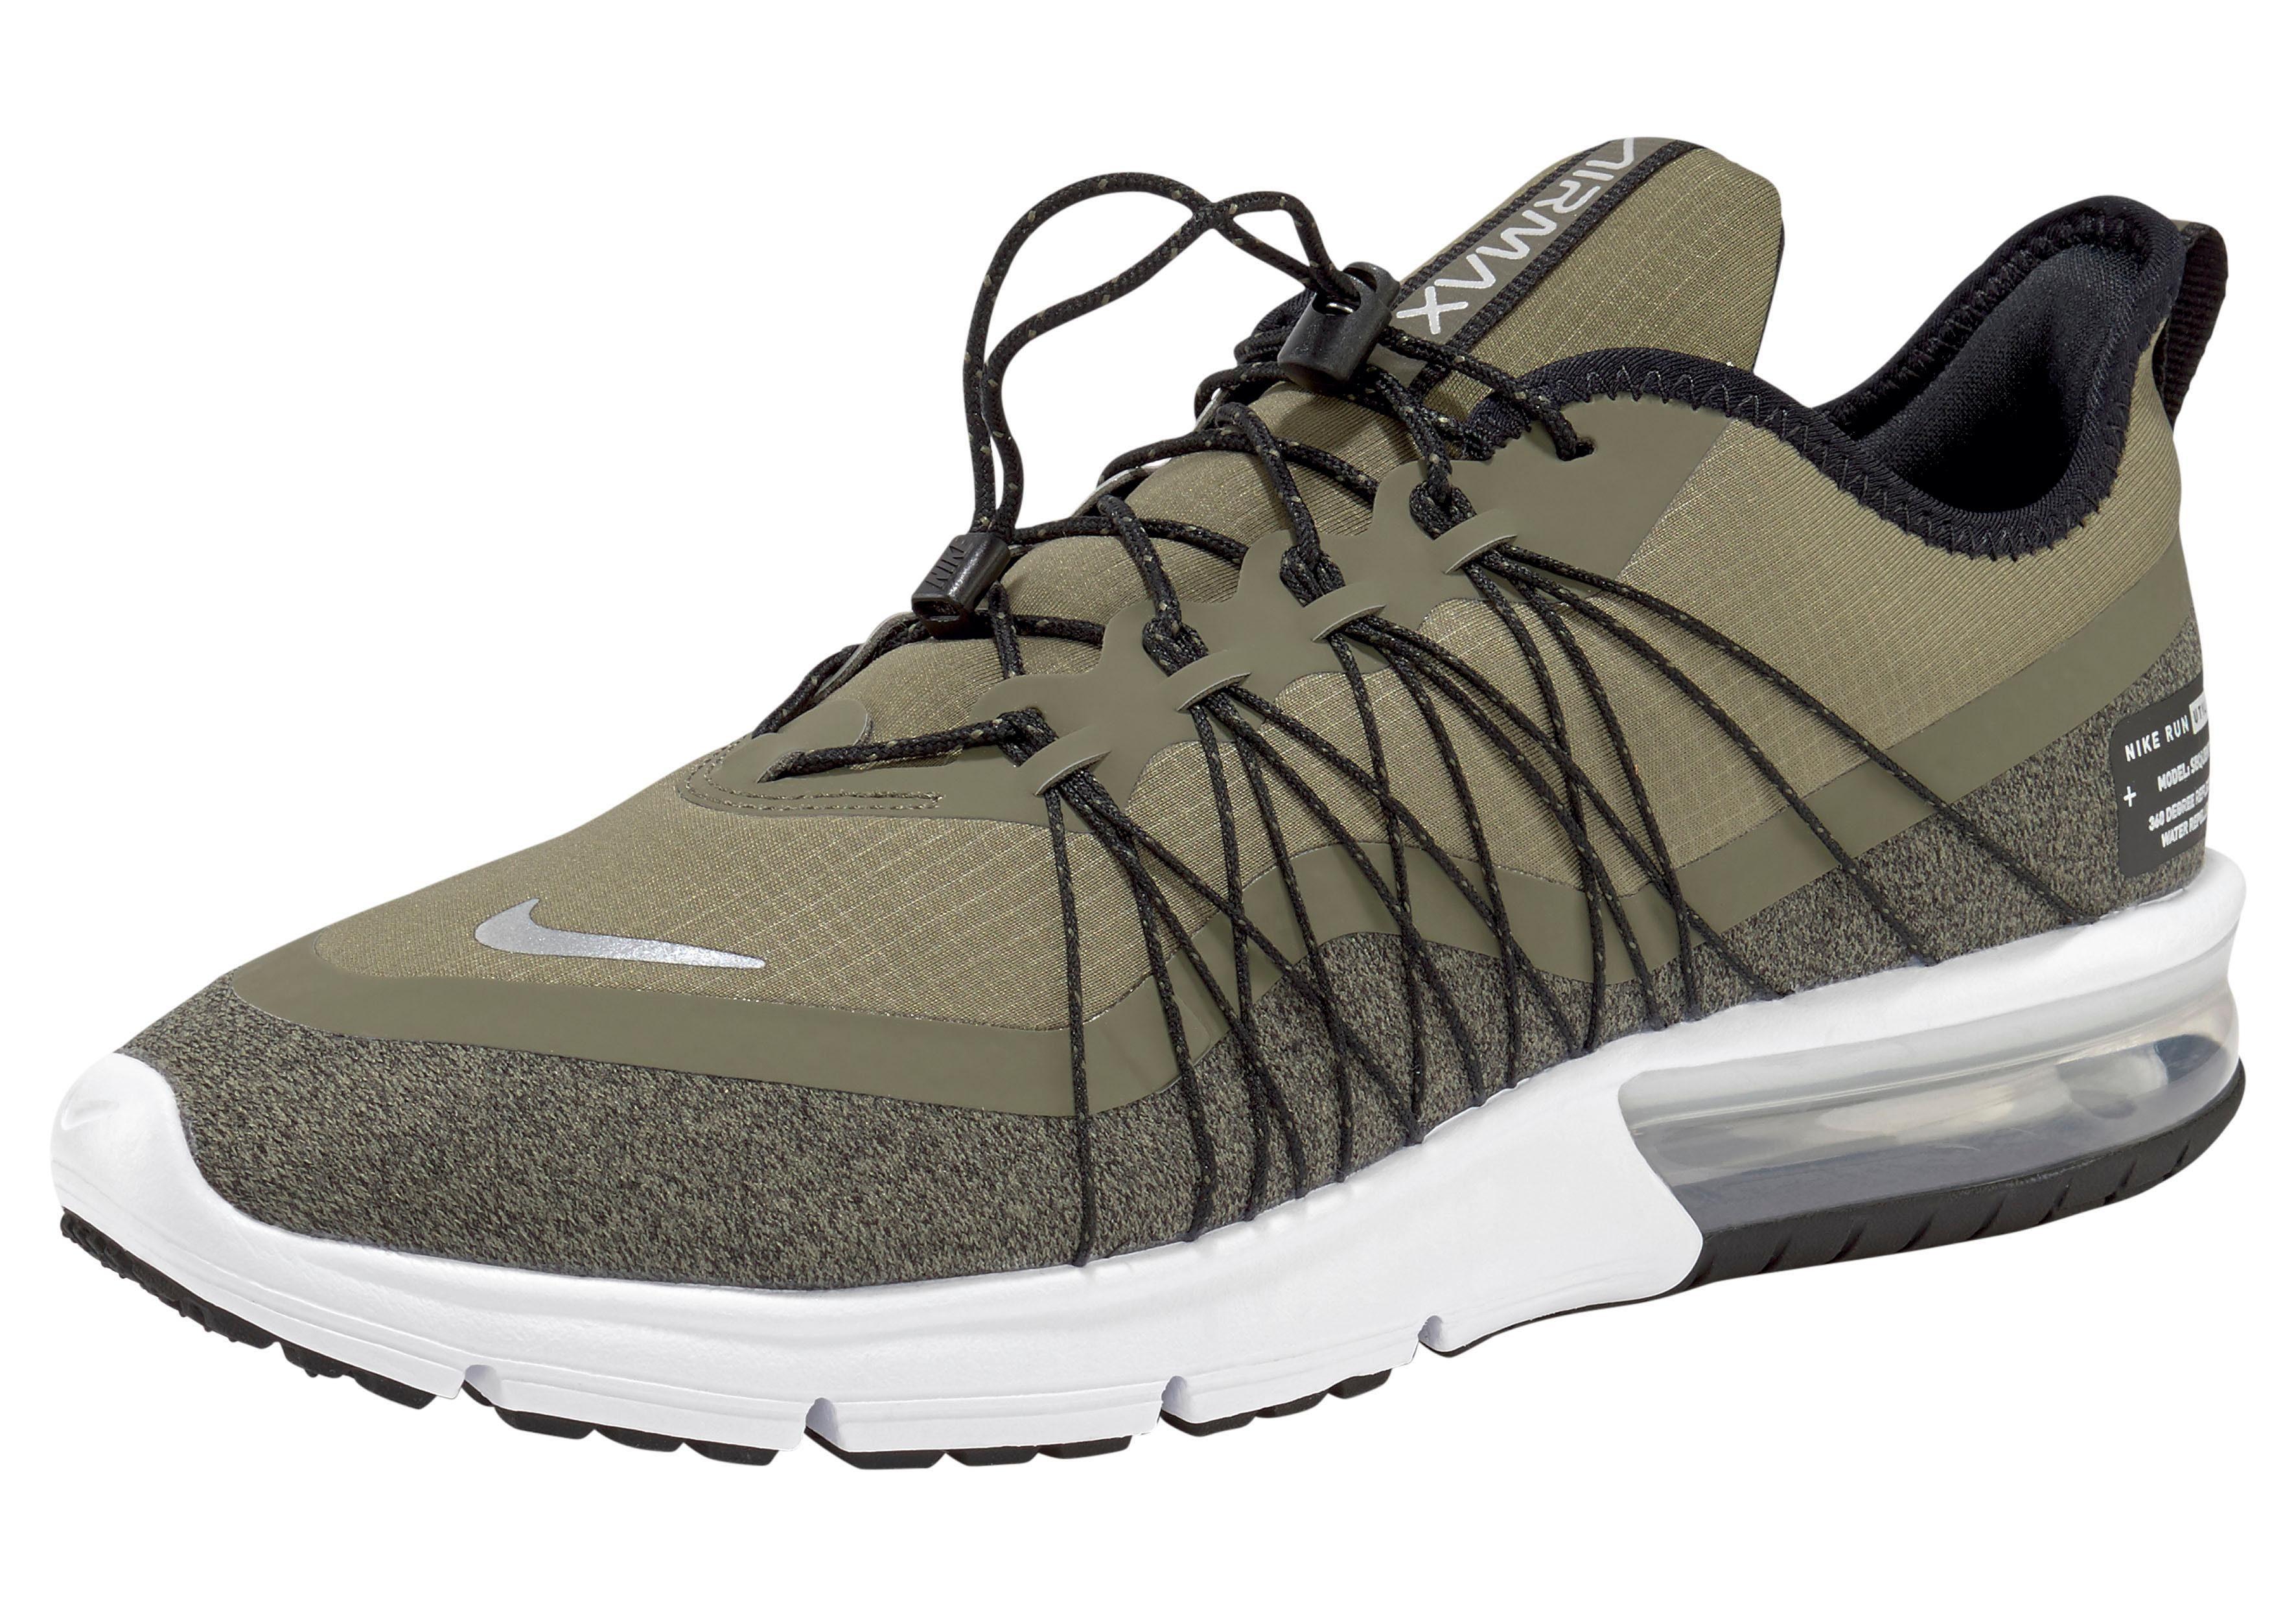 Nike »Air Max Sequent 4 Utility« Laufschuh kaufen | OTTO